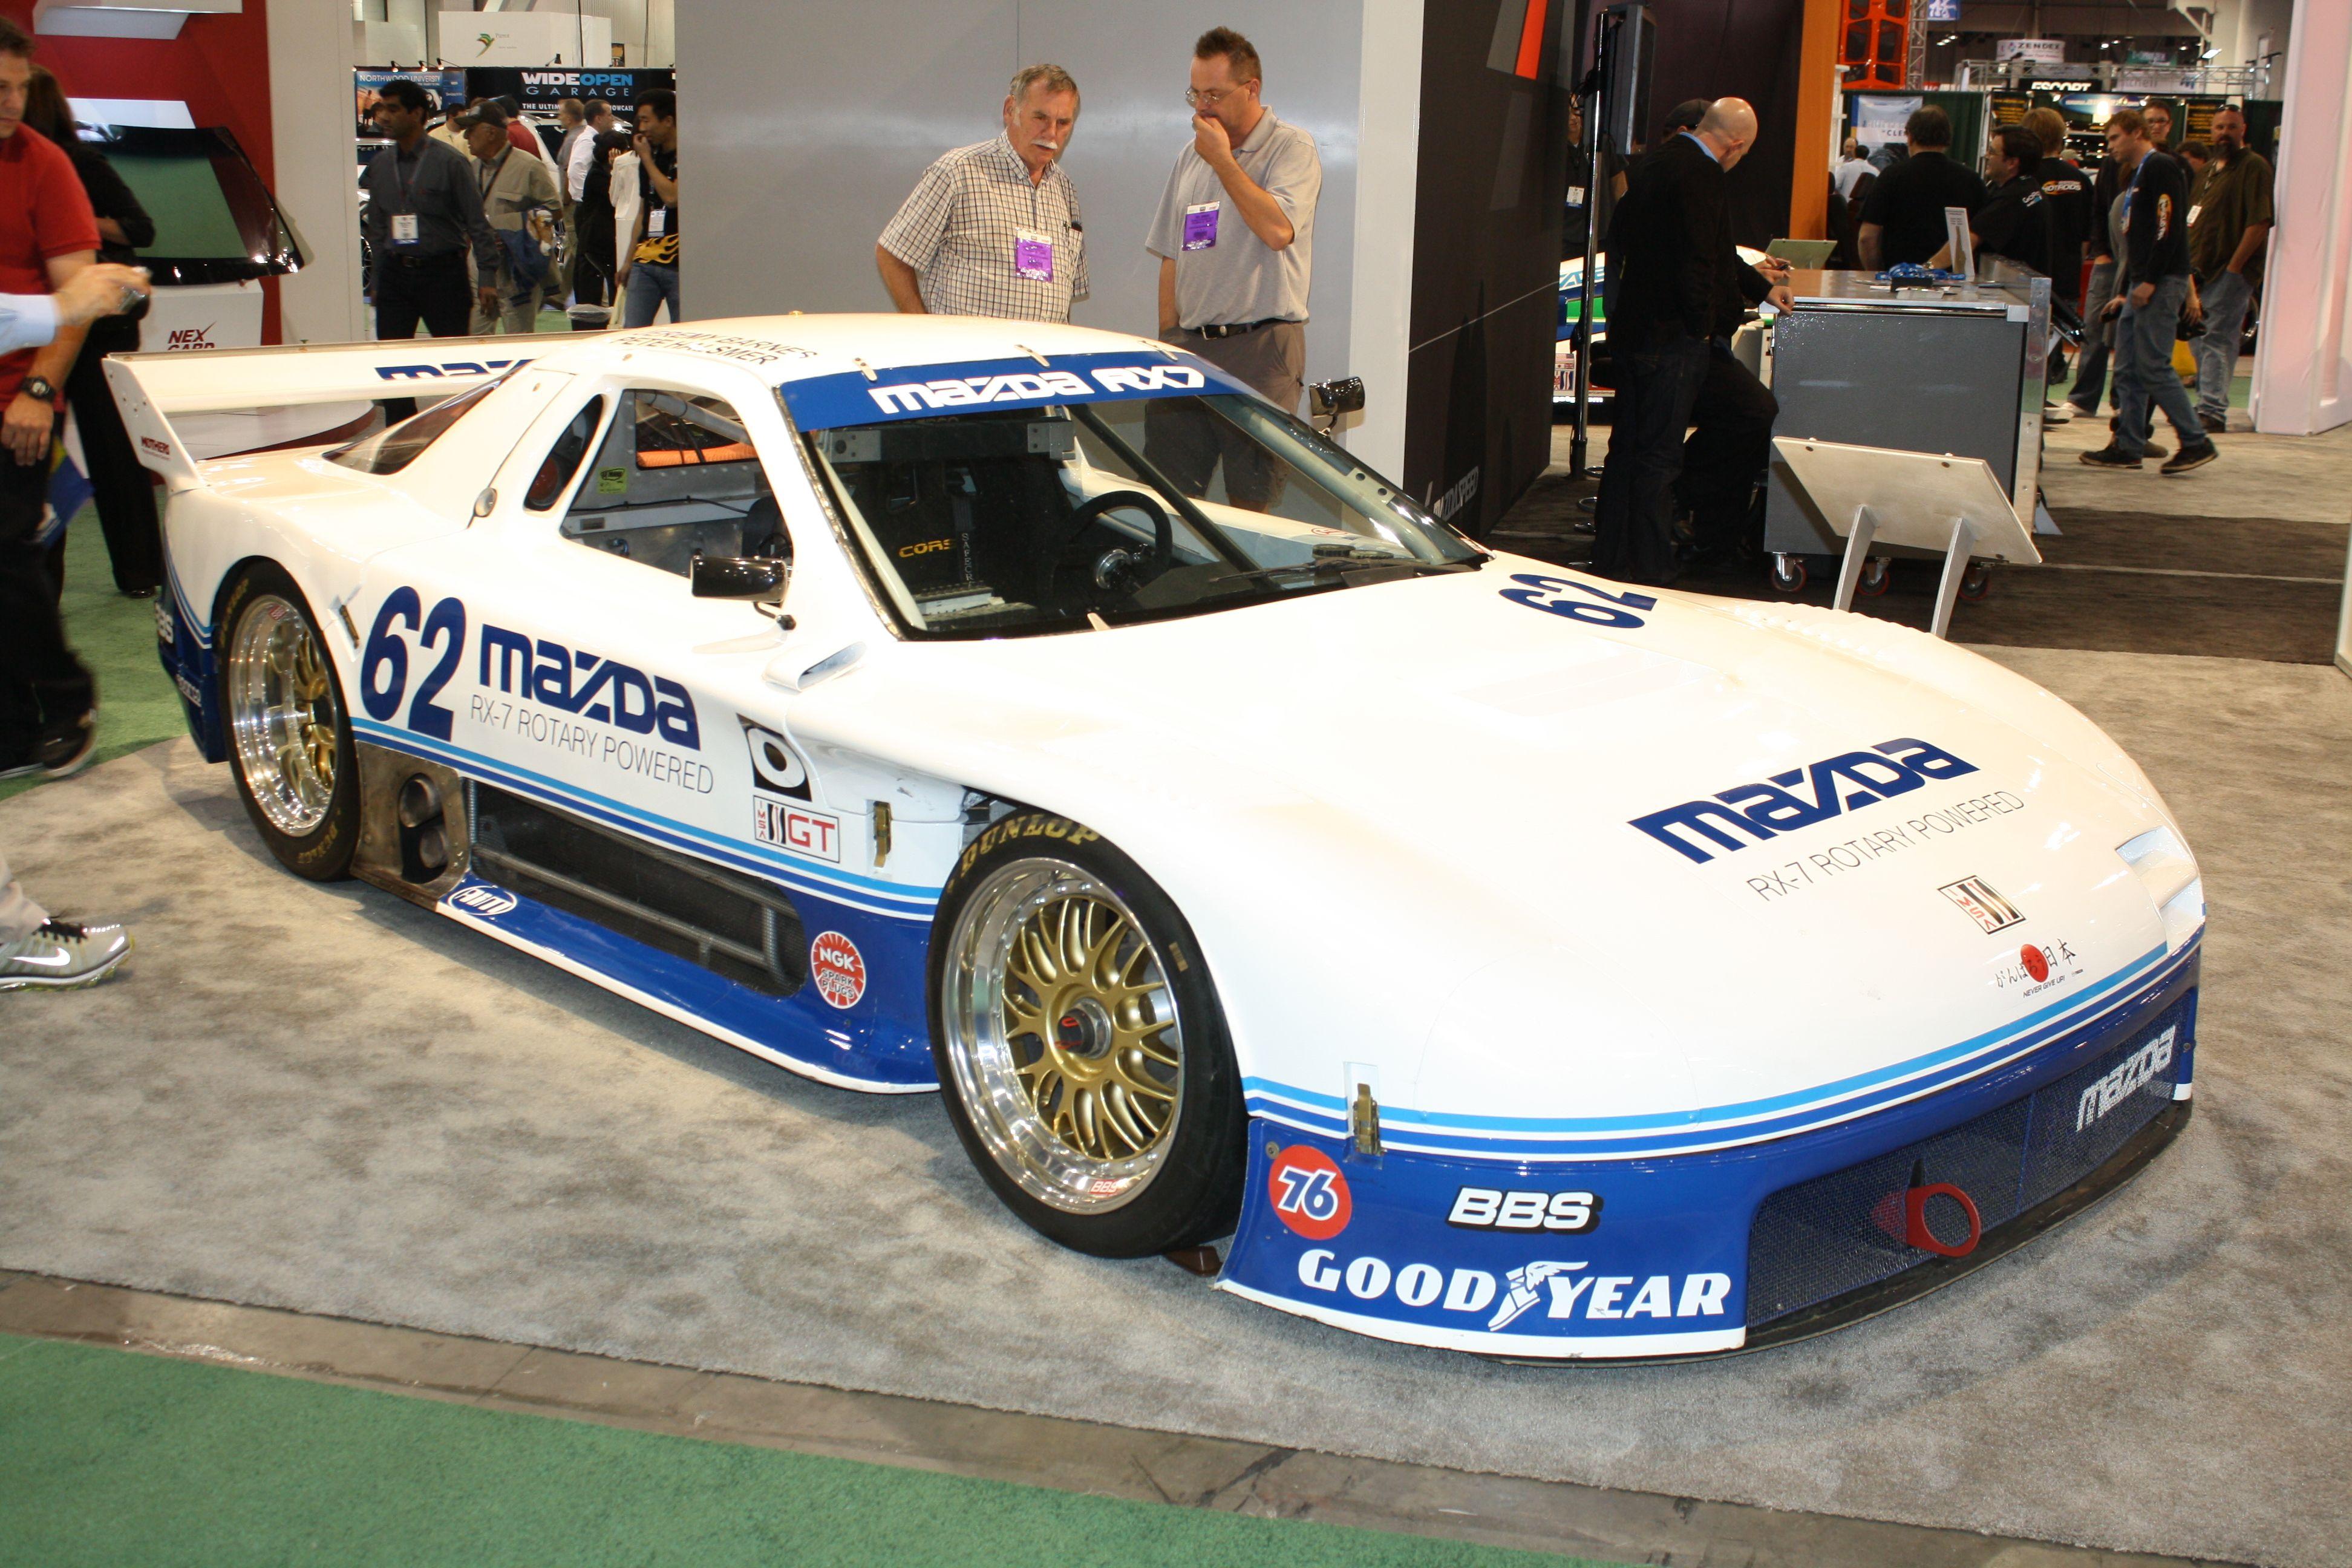 Vintage IMSA GTU Car   Cars   Pinterest   Cars, Mazda and Wheels